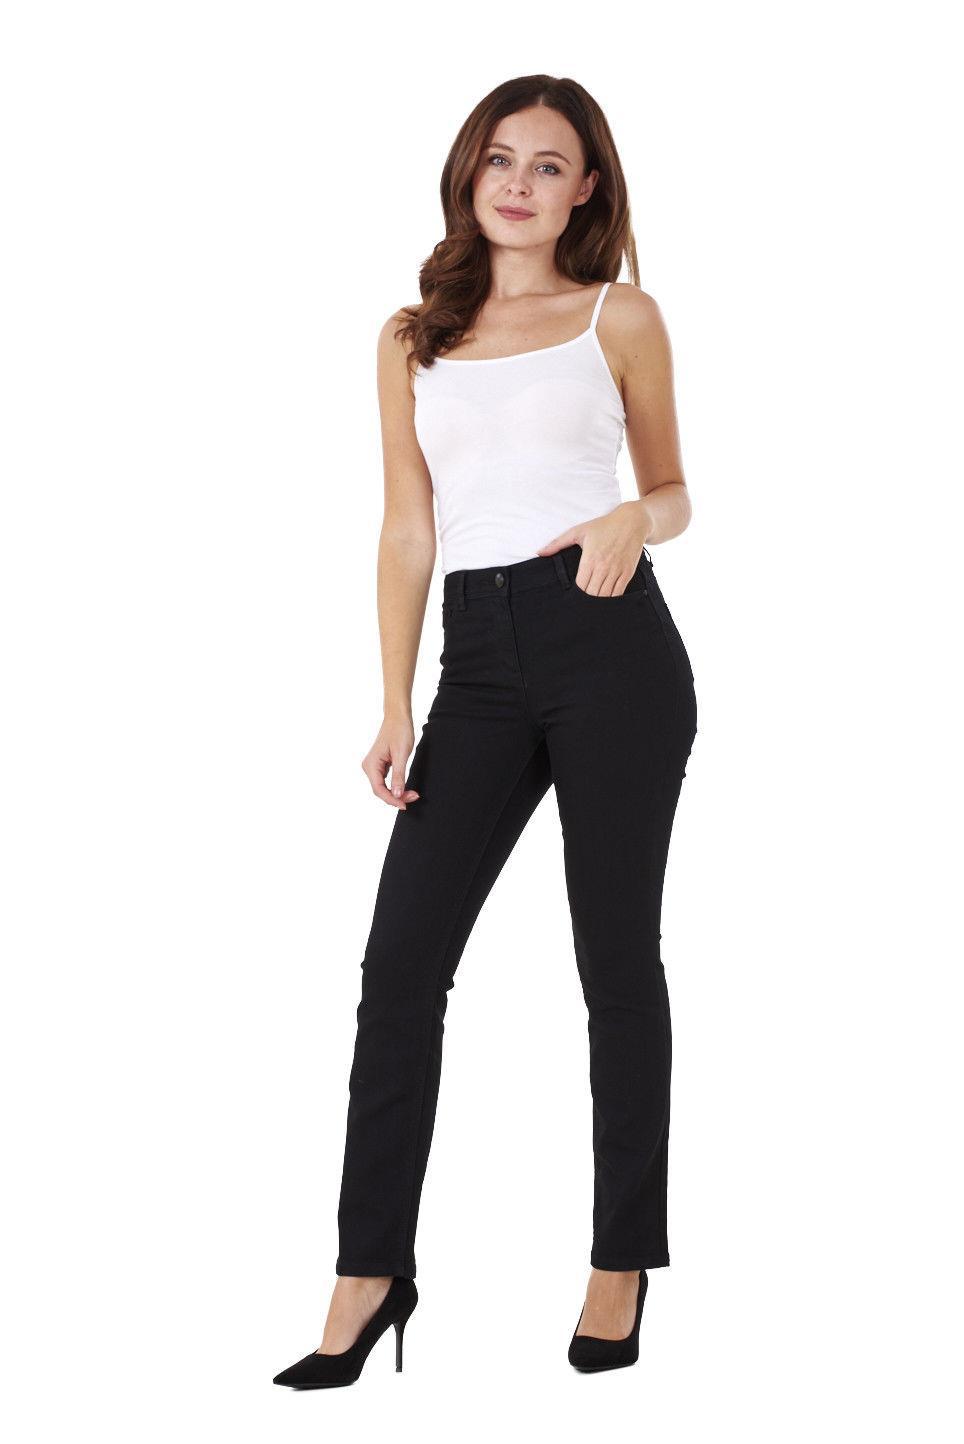 Ladies-Straight-Leg-Denim-Womens-Pants-Stretch-Regular-Fit-Jeans thumbnail 8